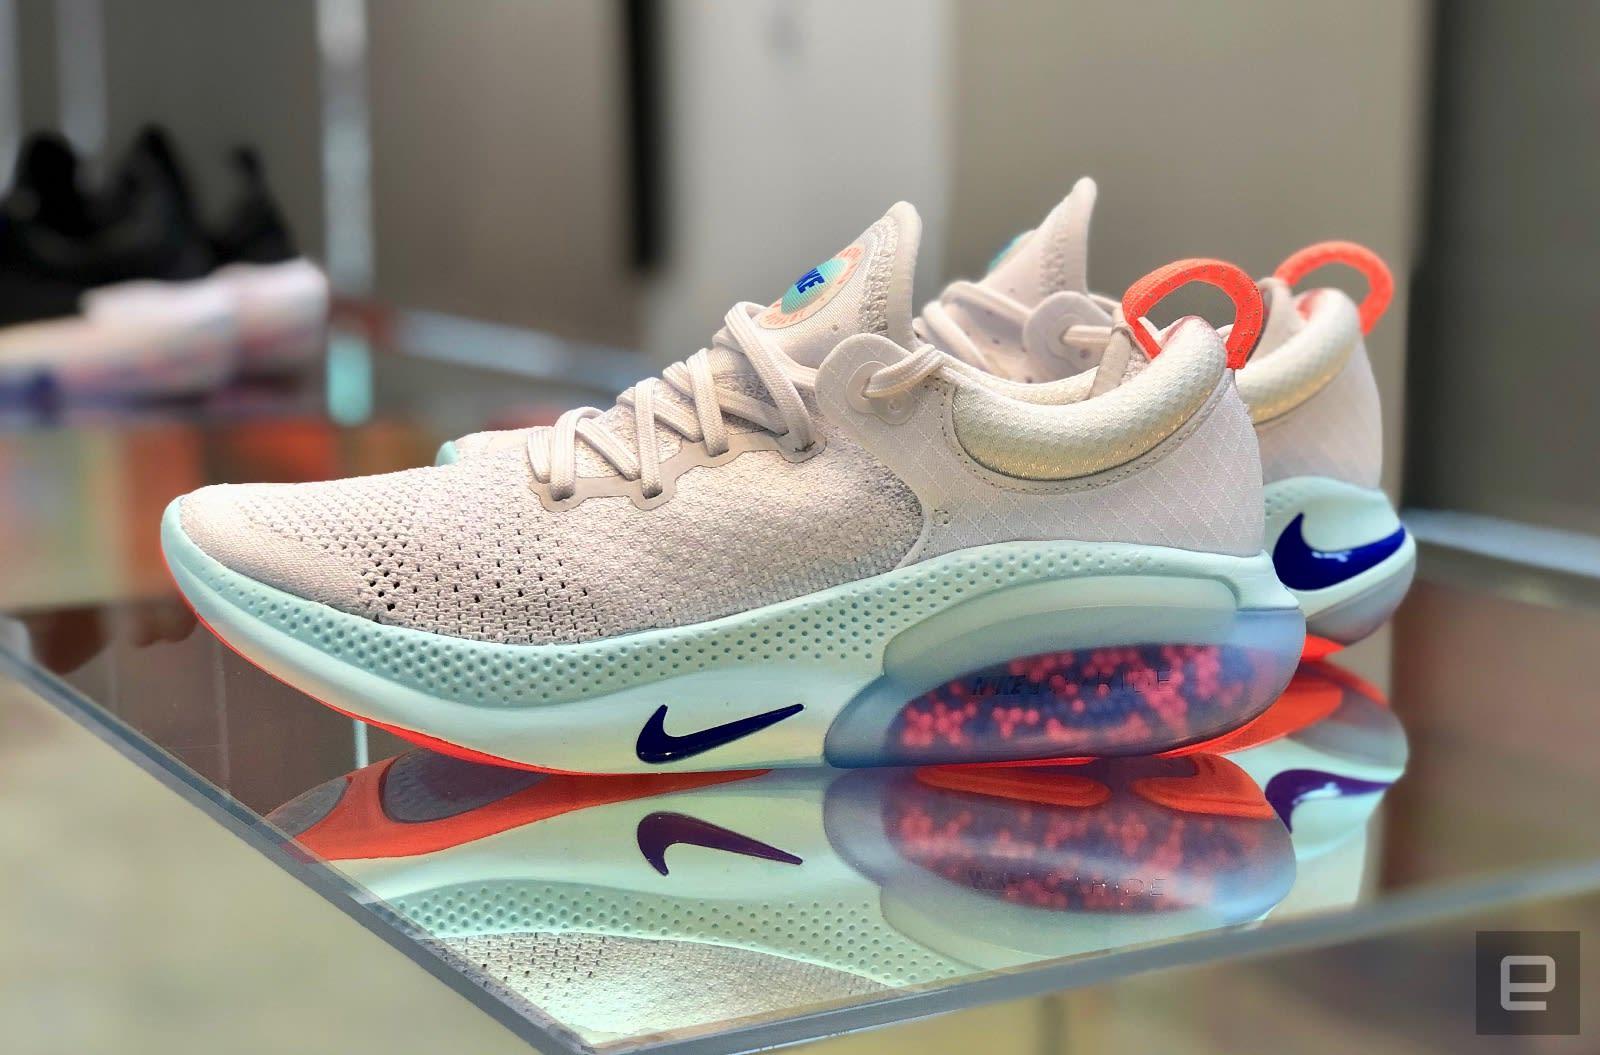 Nike's Joyride shoes use tiny beads to make your runs more comfortable